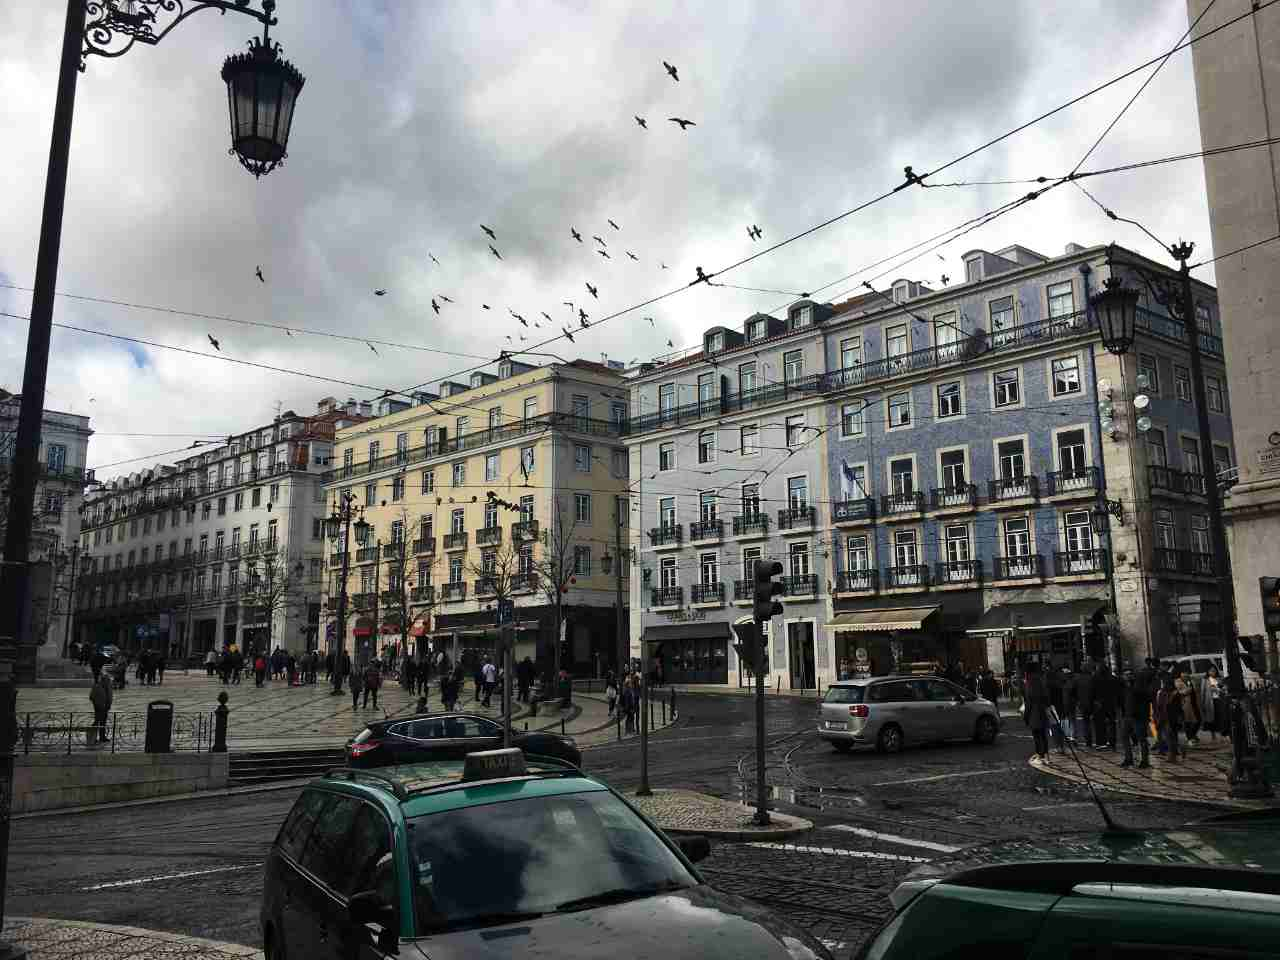 Lisboa no inverno: centro da cidade